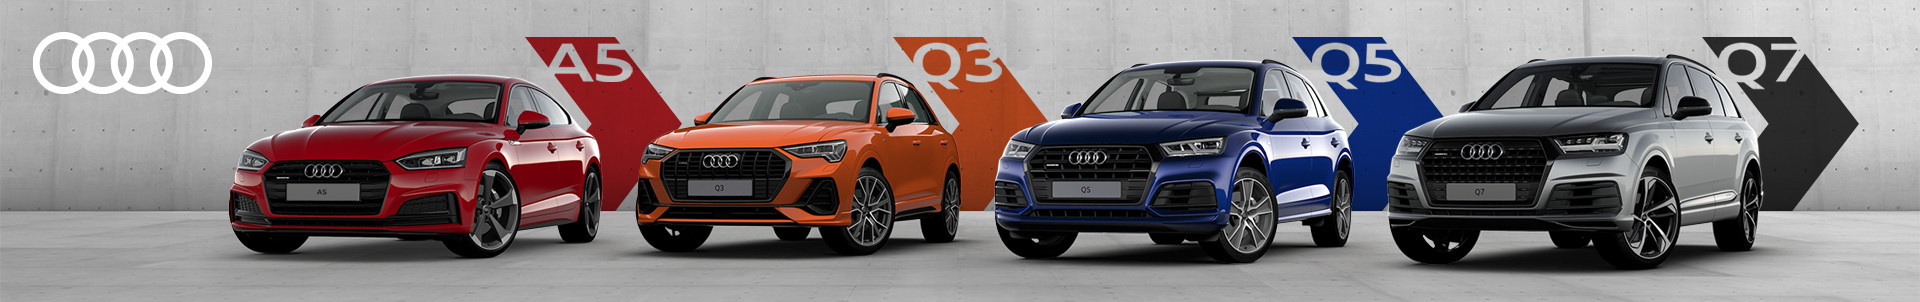 Specjalne ceny na samochody Audi 8